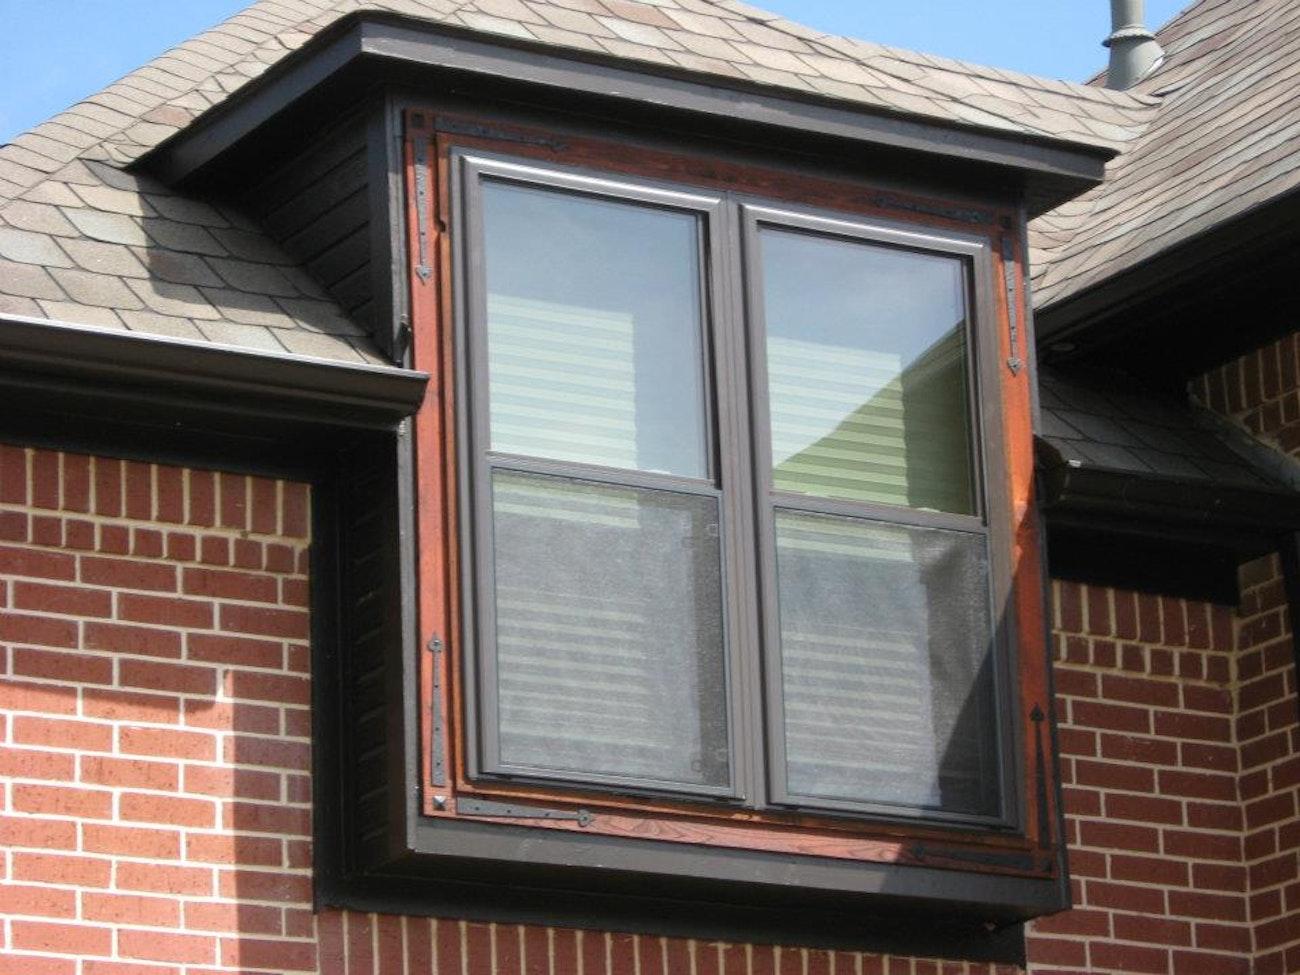 bronze-single-hung-twin-windows-with-red-brick